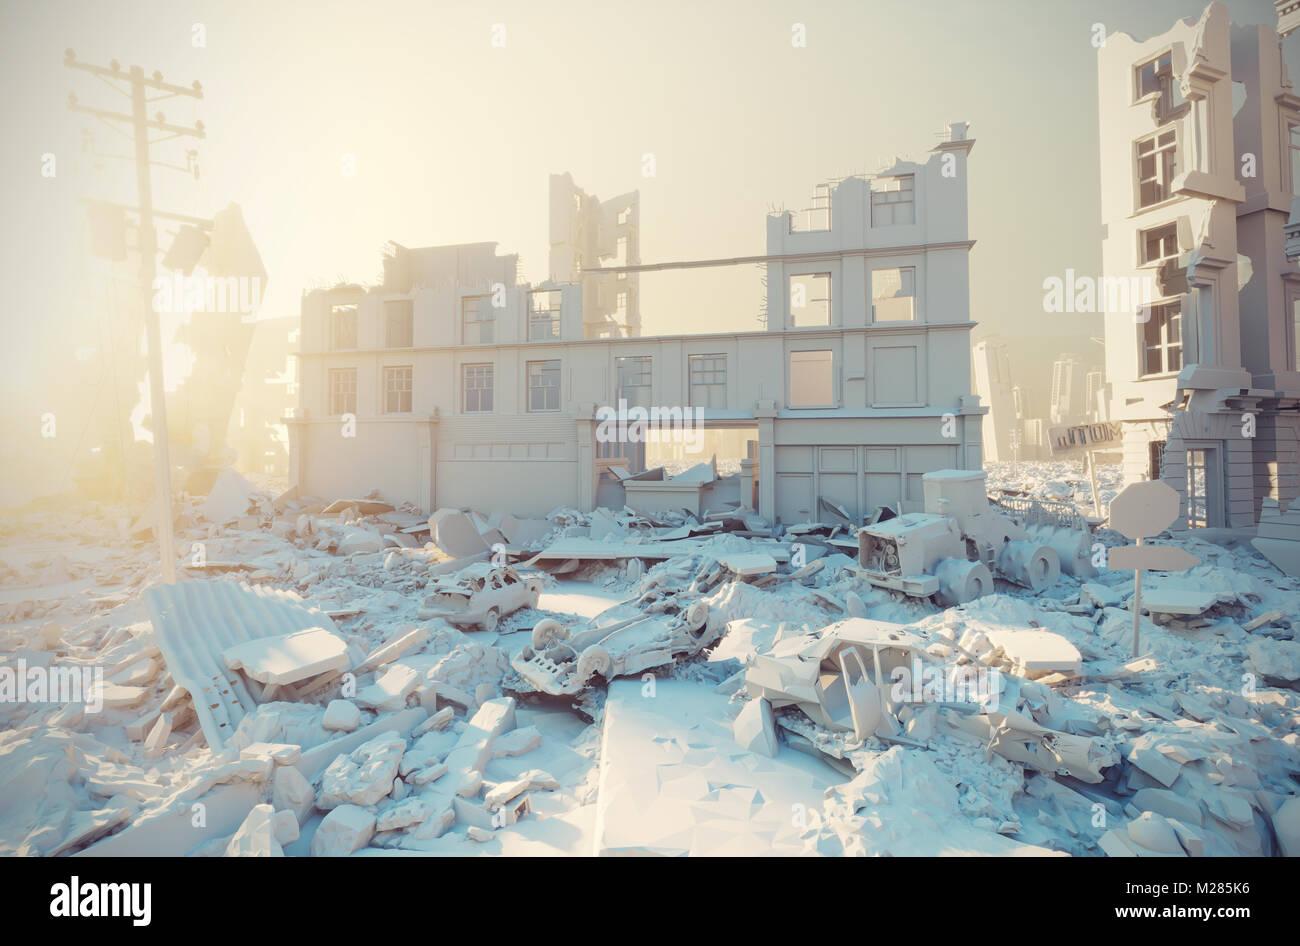 apocalyptic white city sunset. Creative 3D illustration - Stock Image